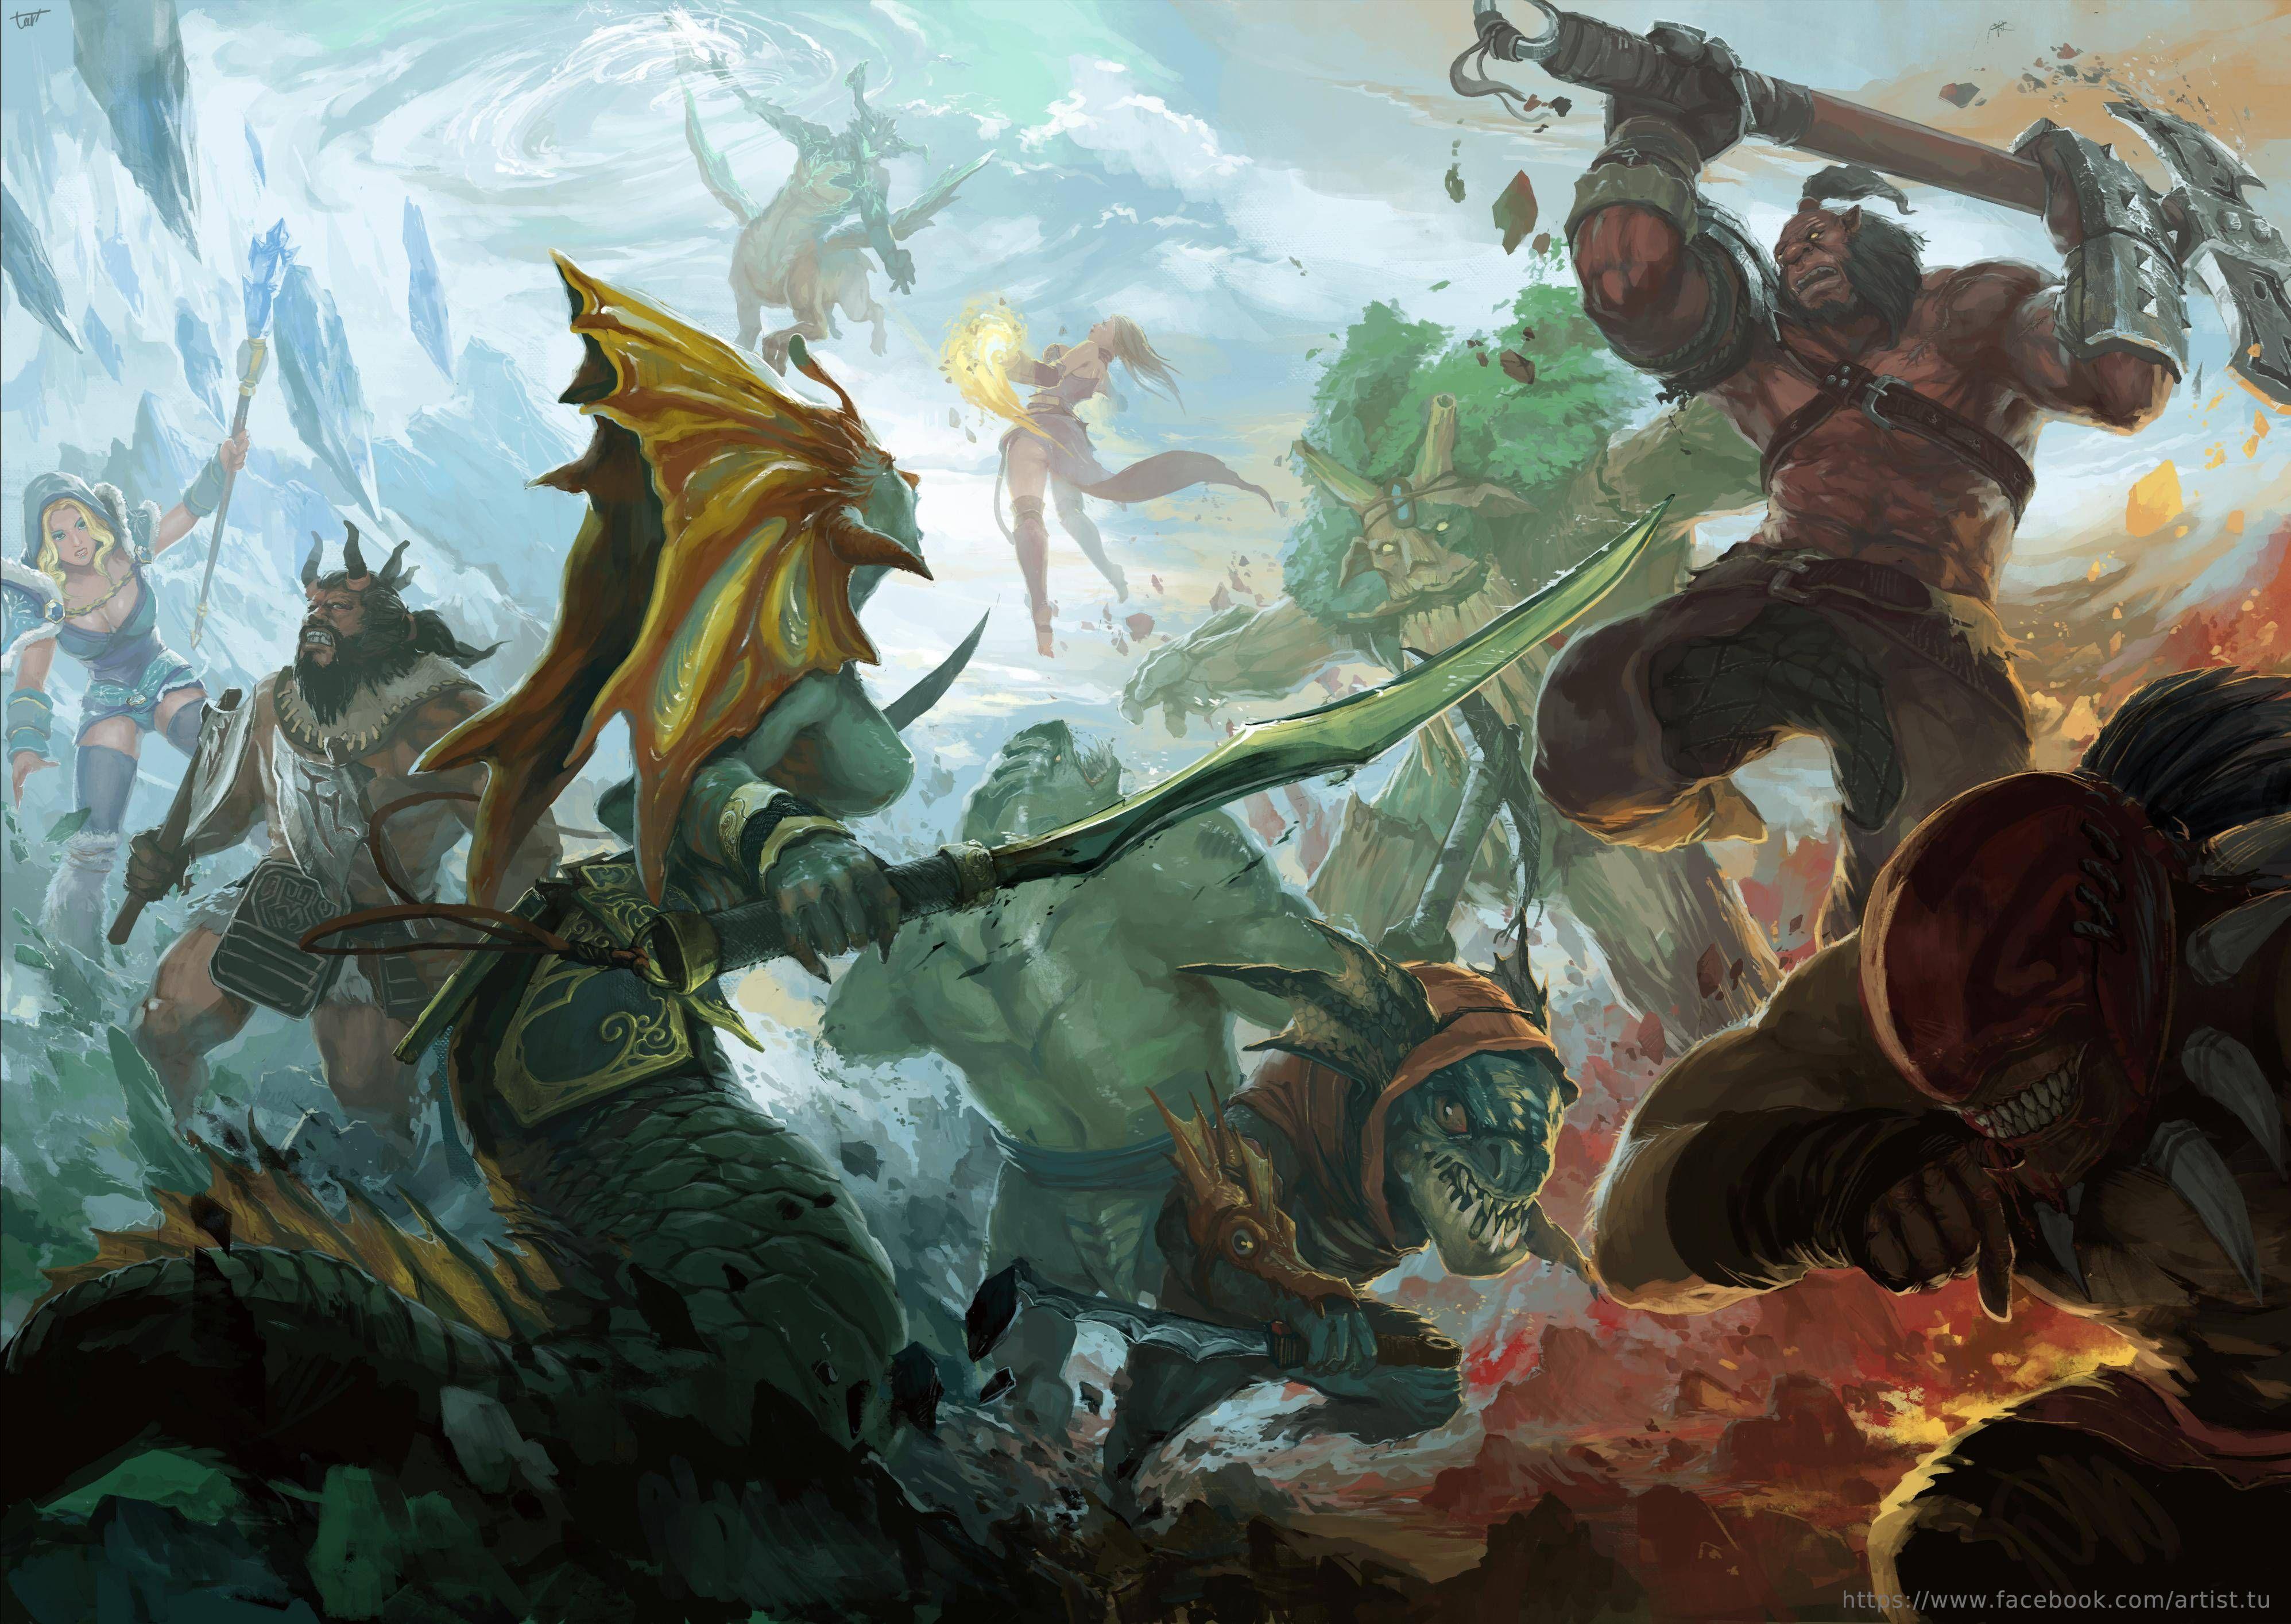 Amazing Dota 2 clash painting by Tuartist, a Vietnamese artist | Character  art 3d, Art, Warcraft art